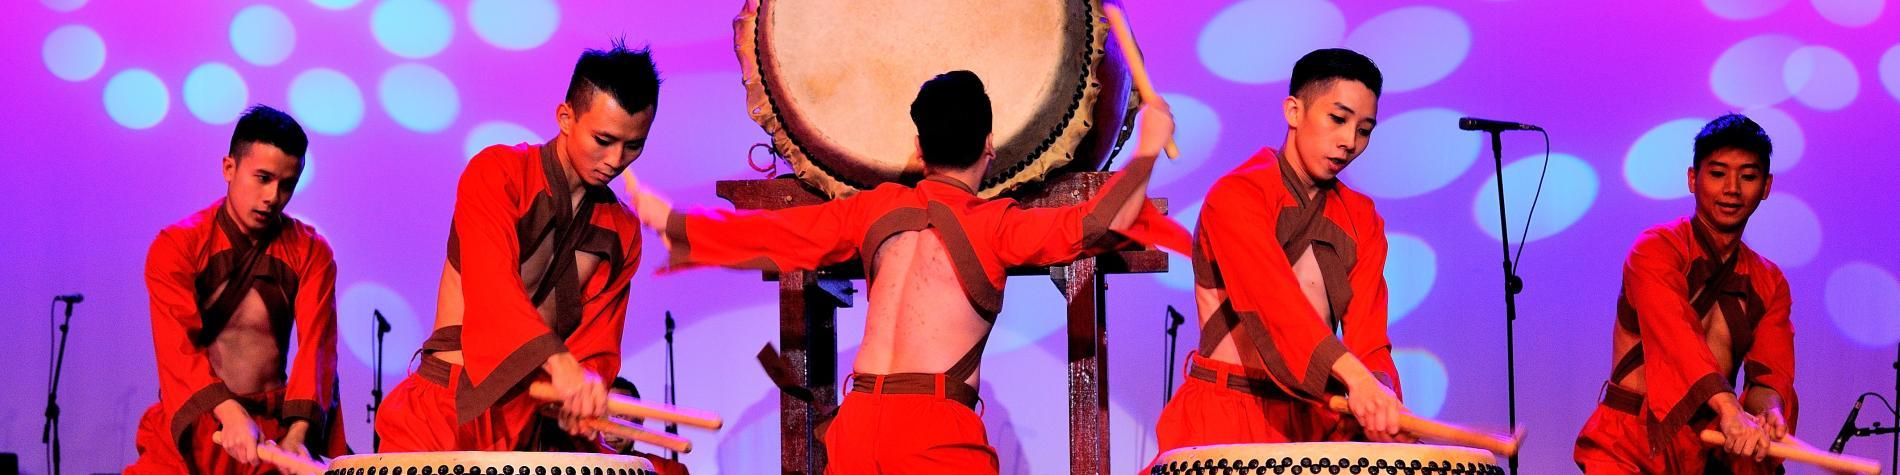 Festifolk, Festival mondial de Folklore à Saint-Ghislain | La Malaisie